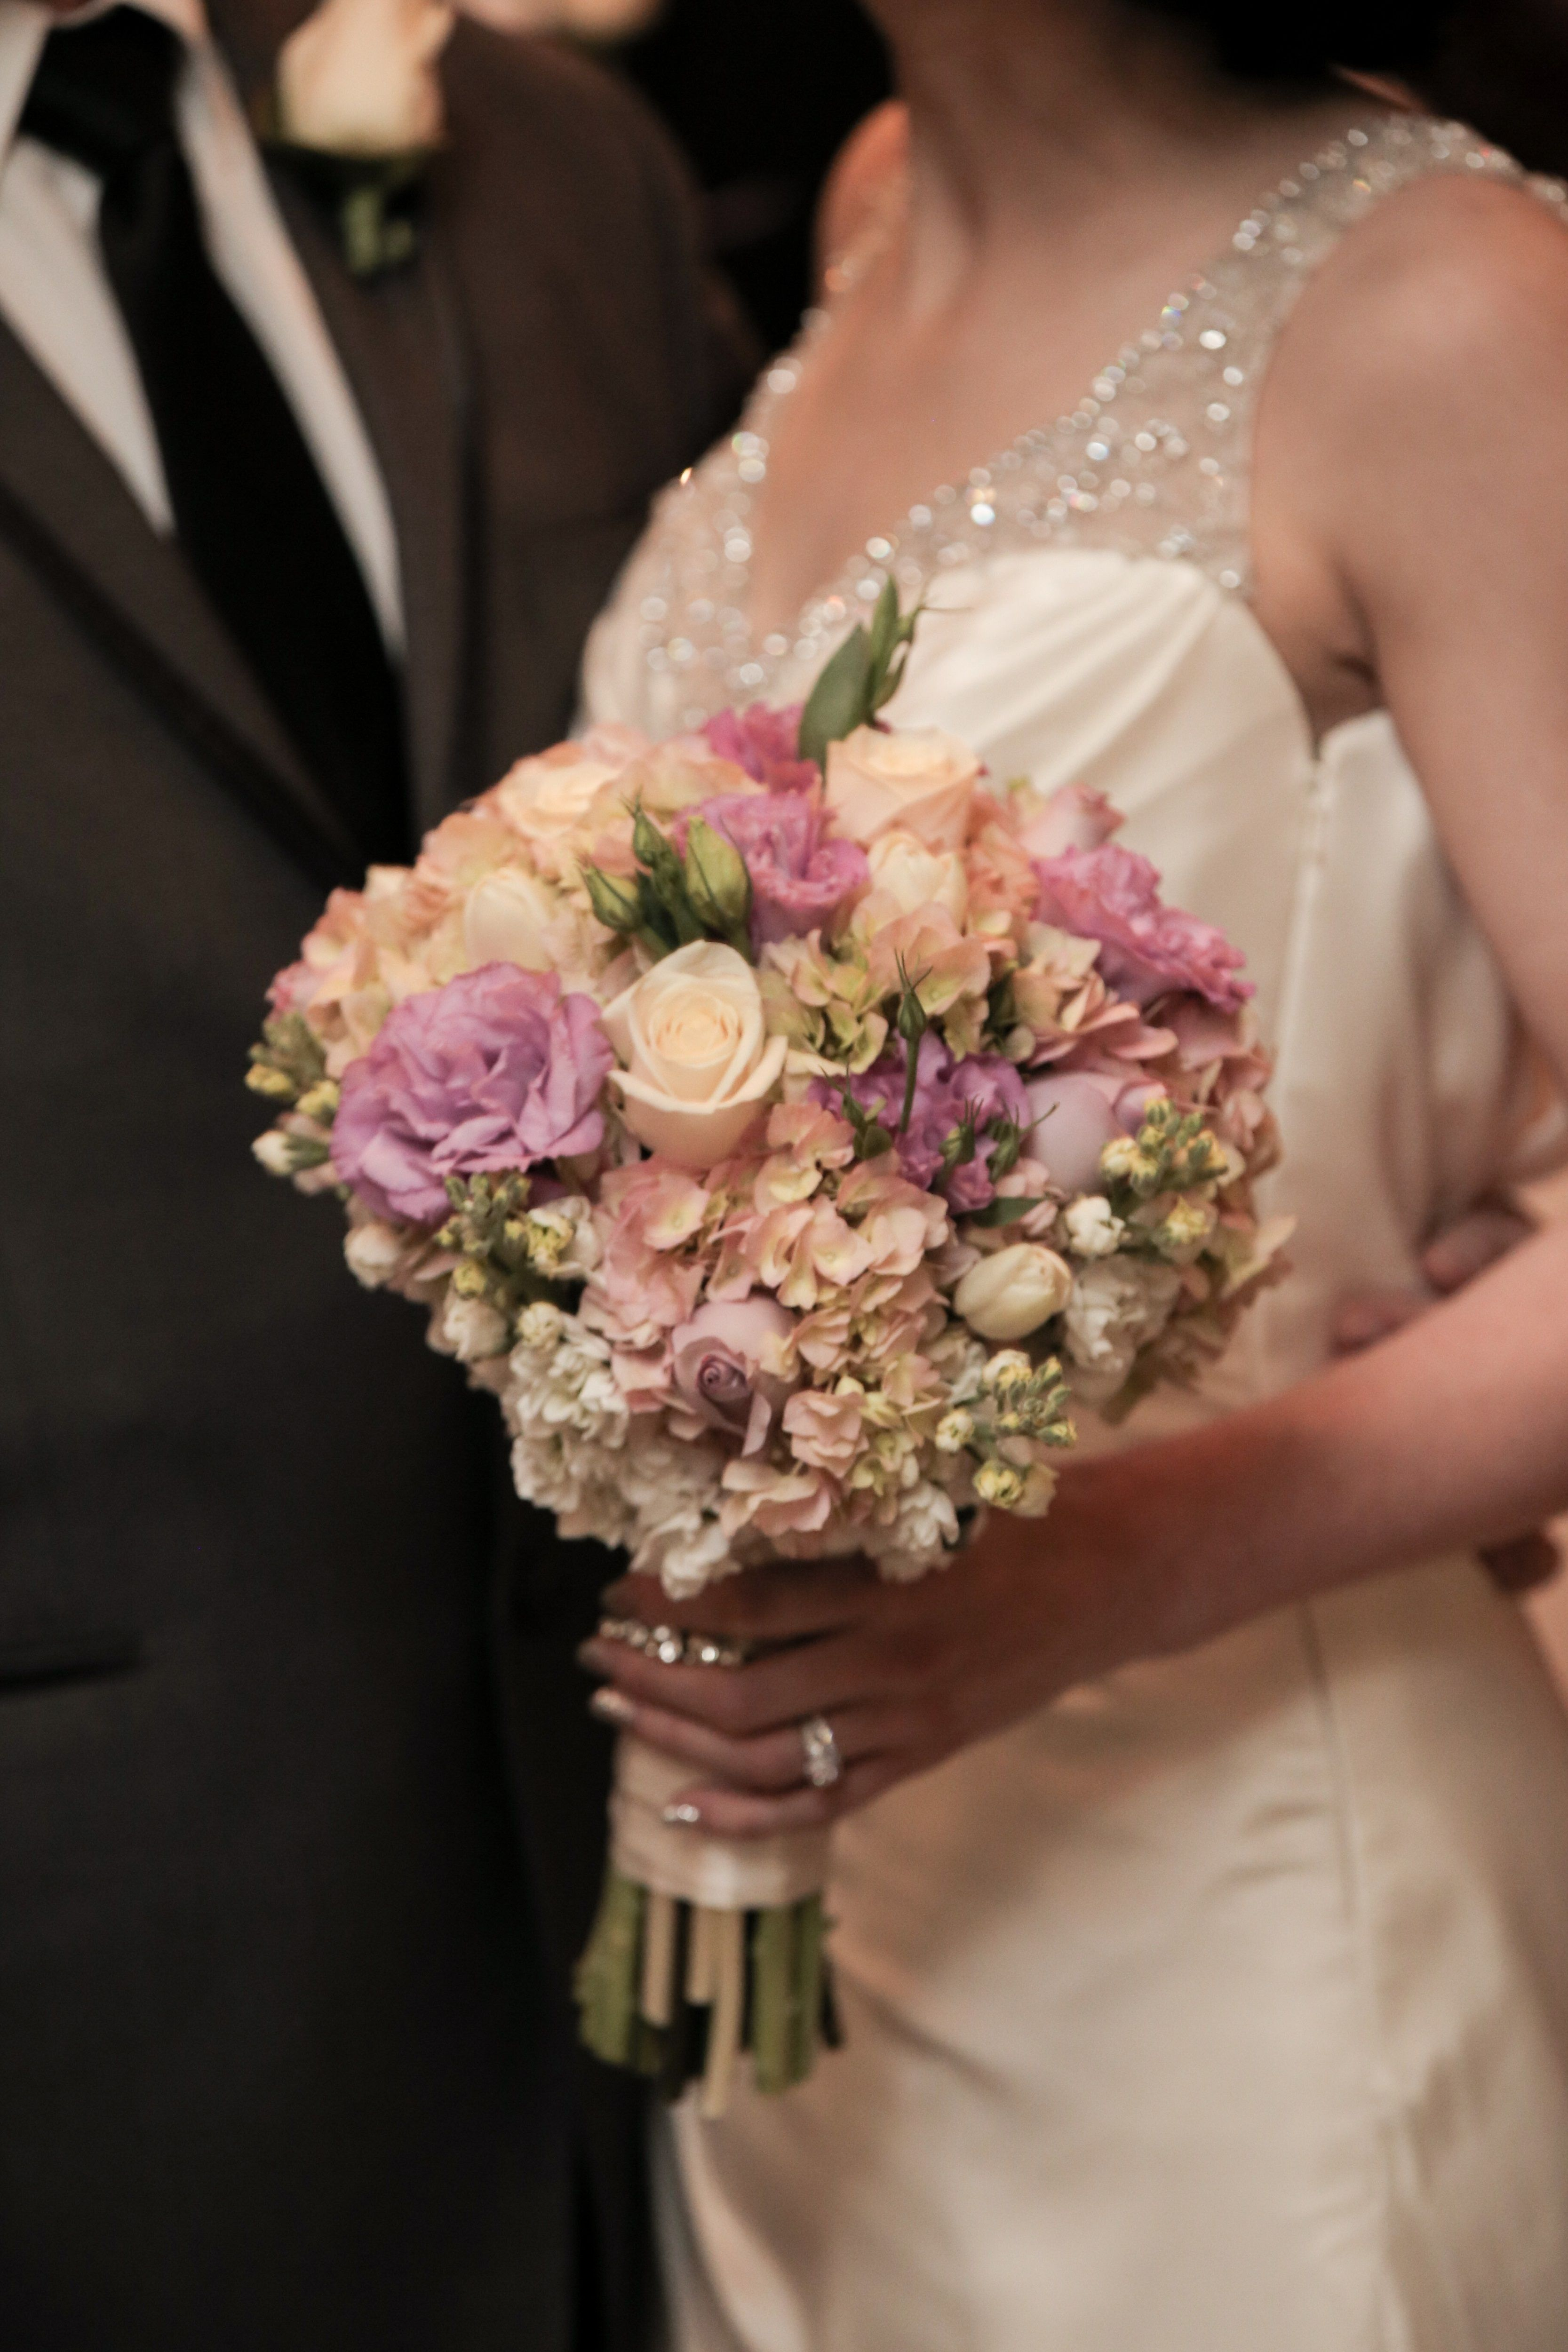 Blush Bridal Bouquet Perfect For Vintage Weddings Wedding Flower Ideas